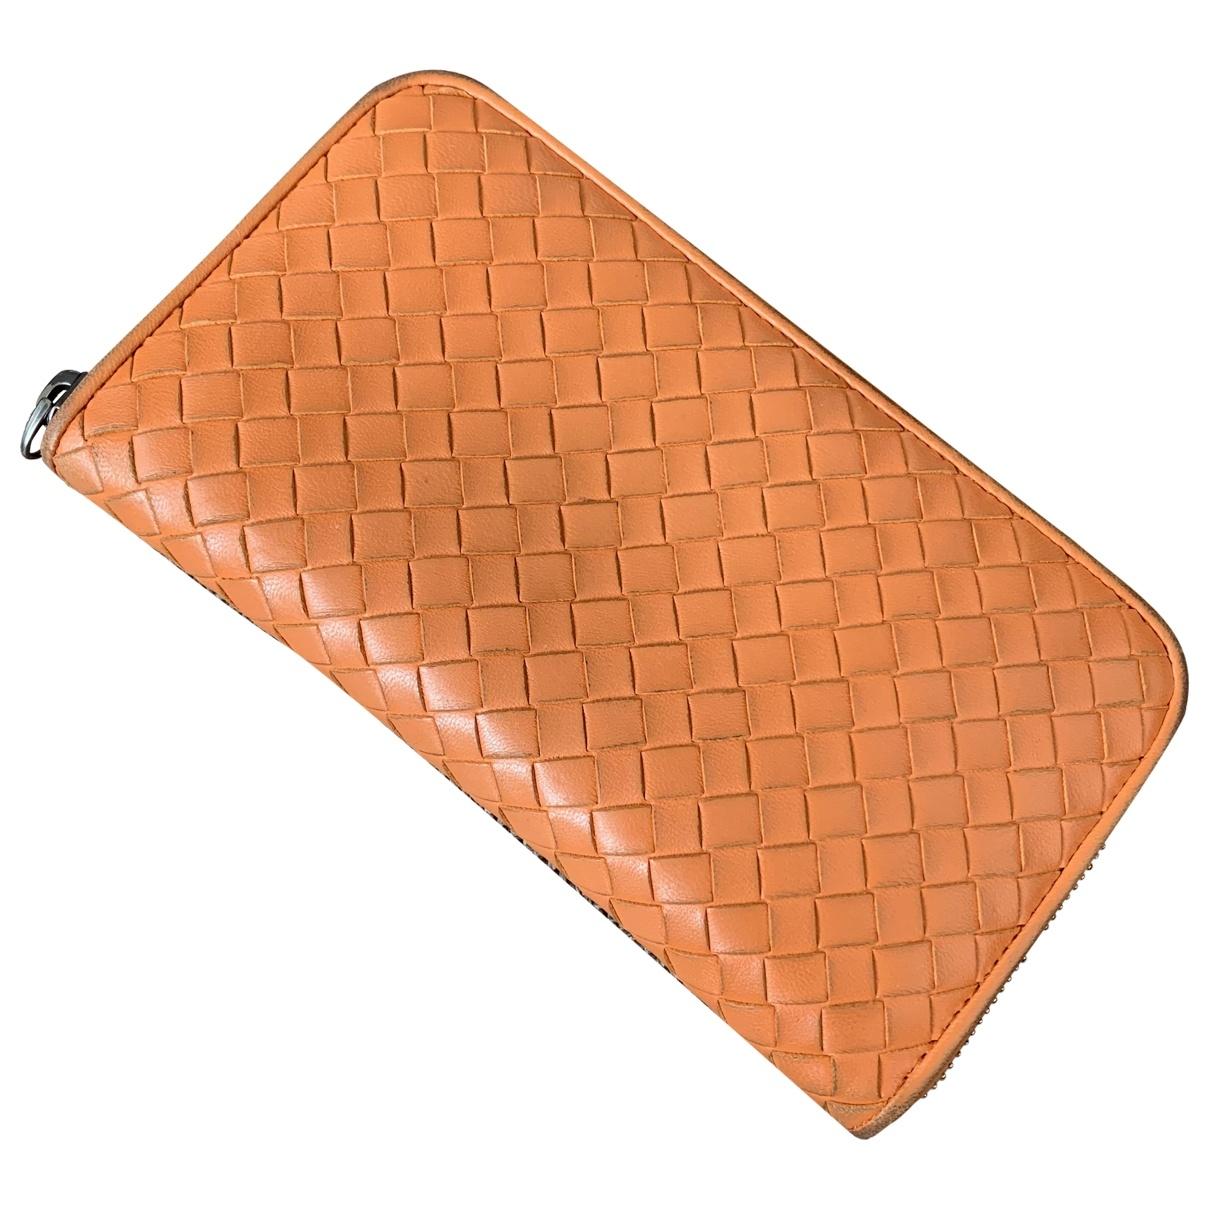 Bottega Veneta - Portefeuille   pour femme en cuir - orange